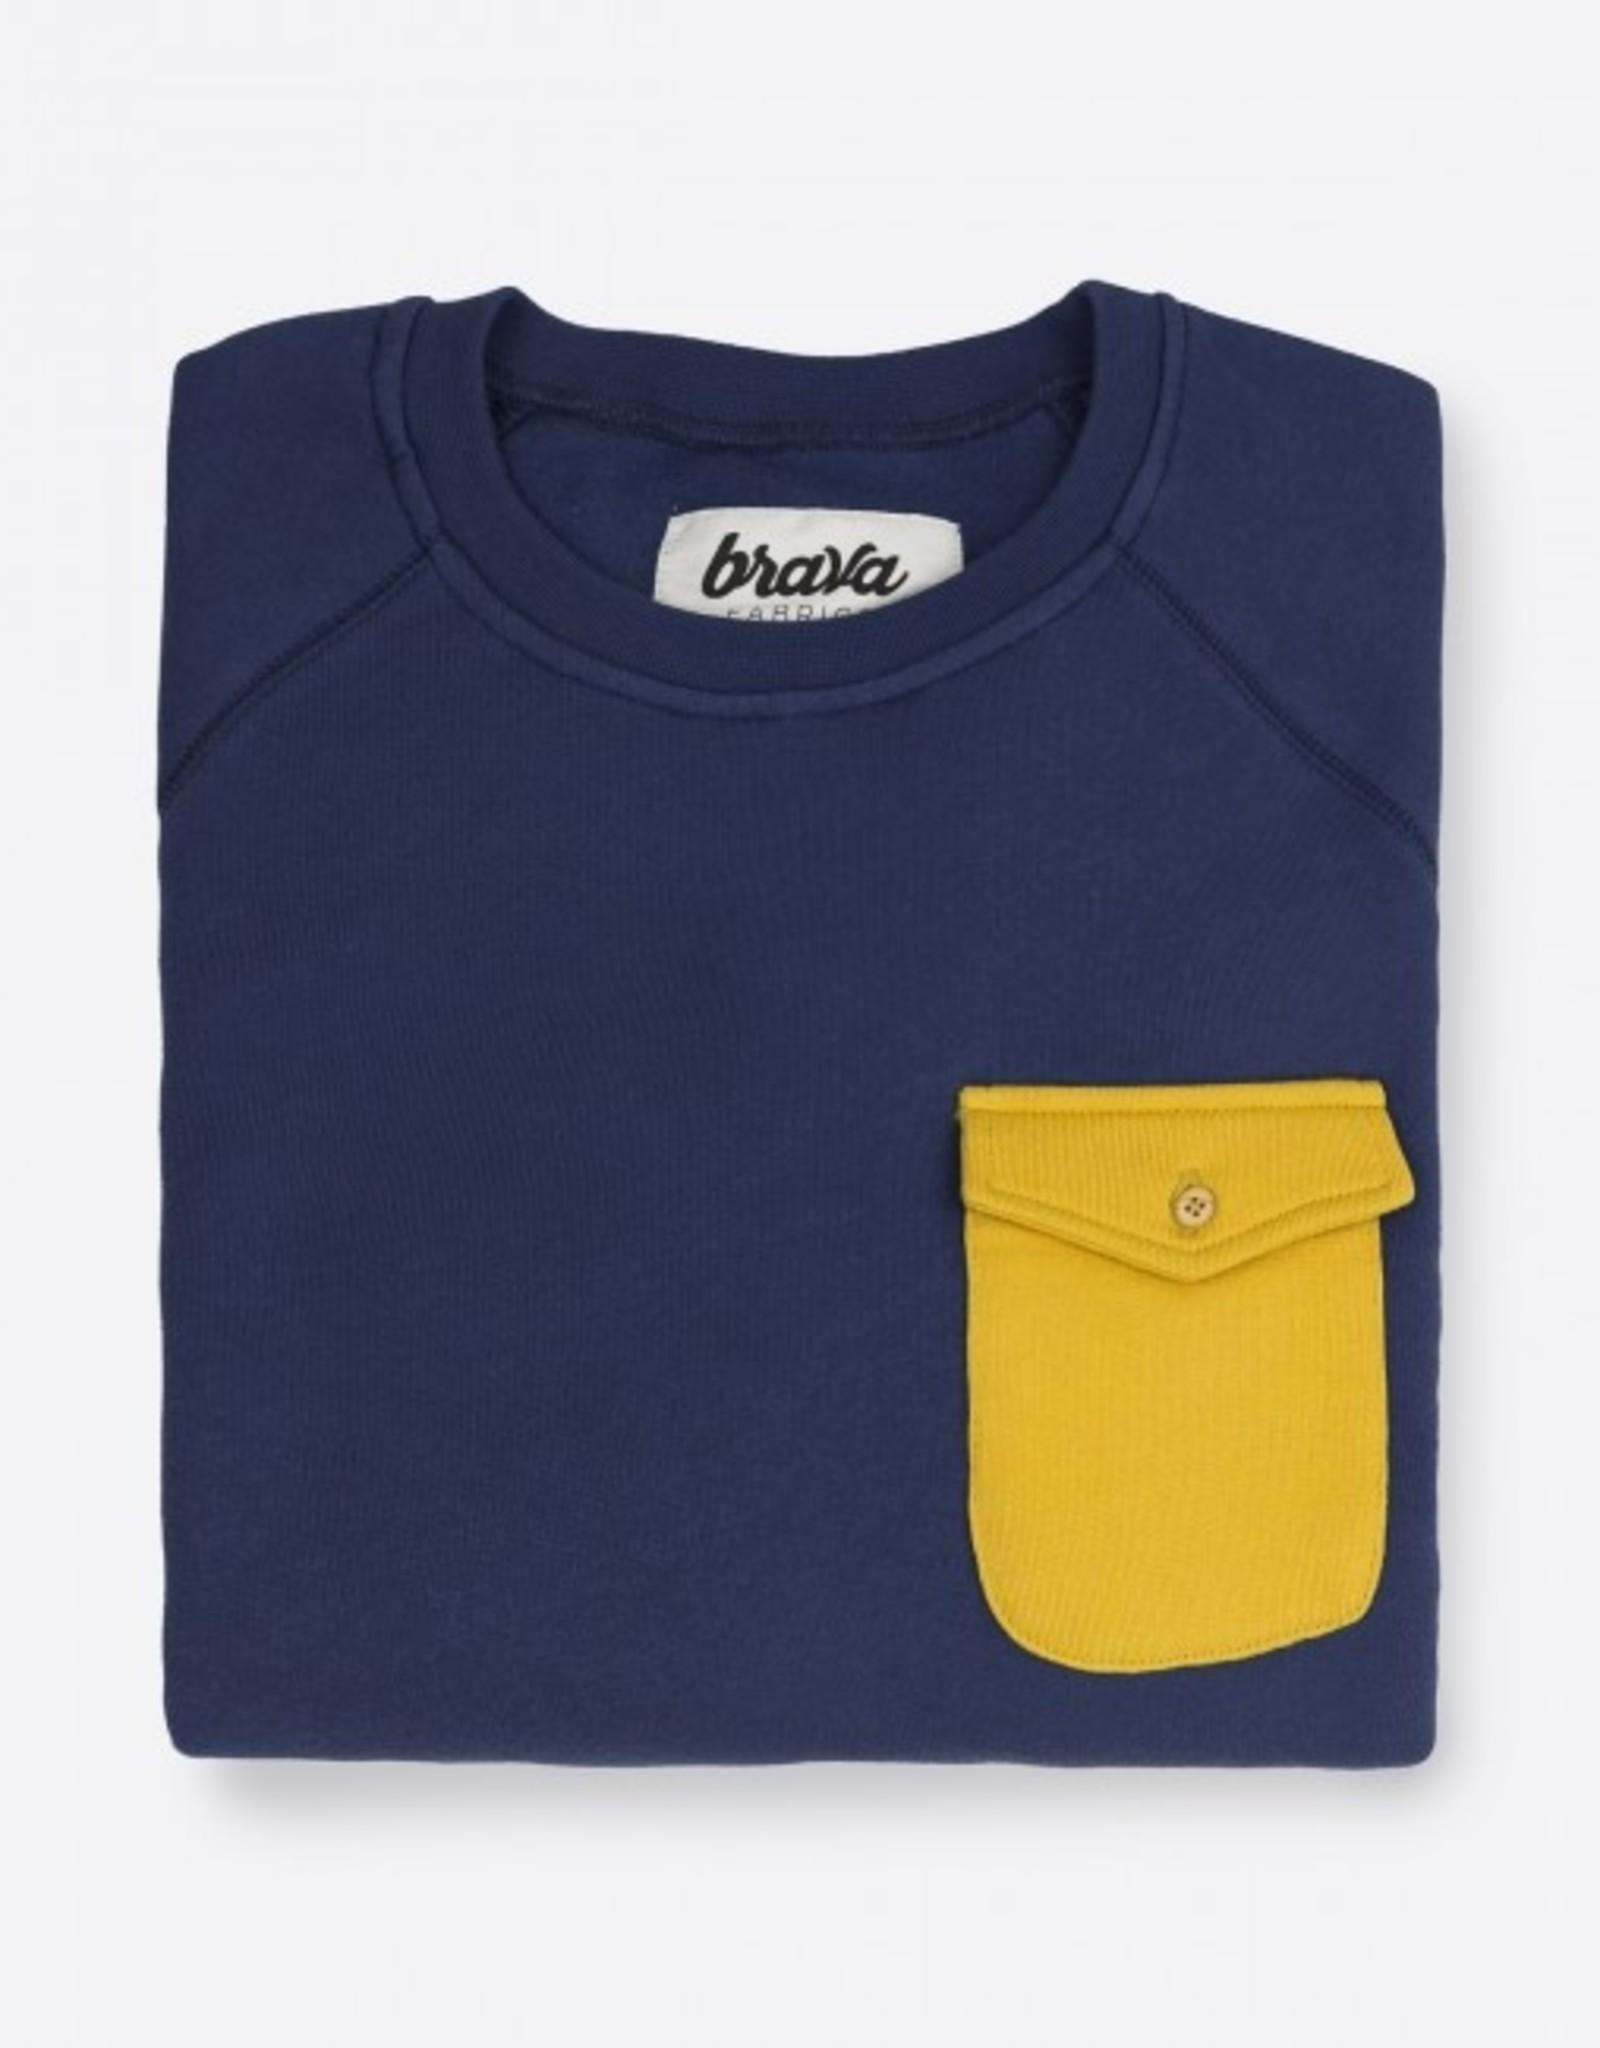 Brava Fabrics SWEATSHIRT SWEDEN ESSENTIAL